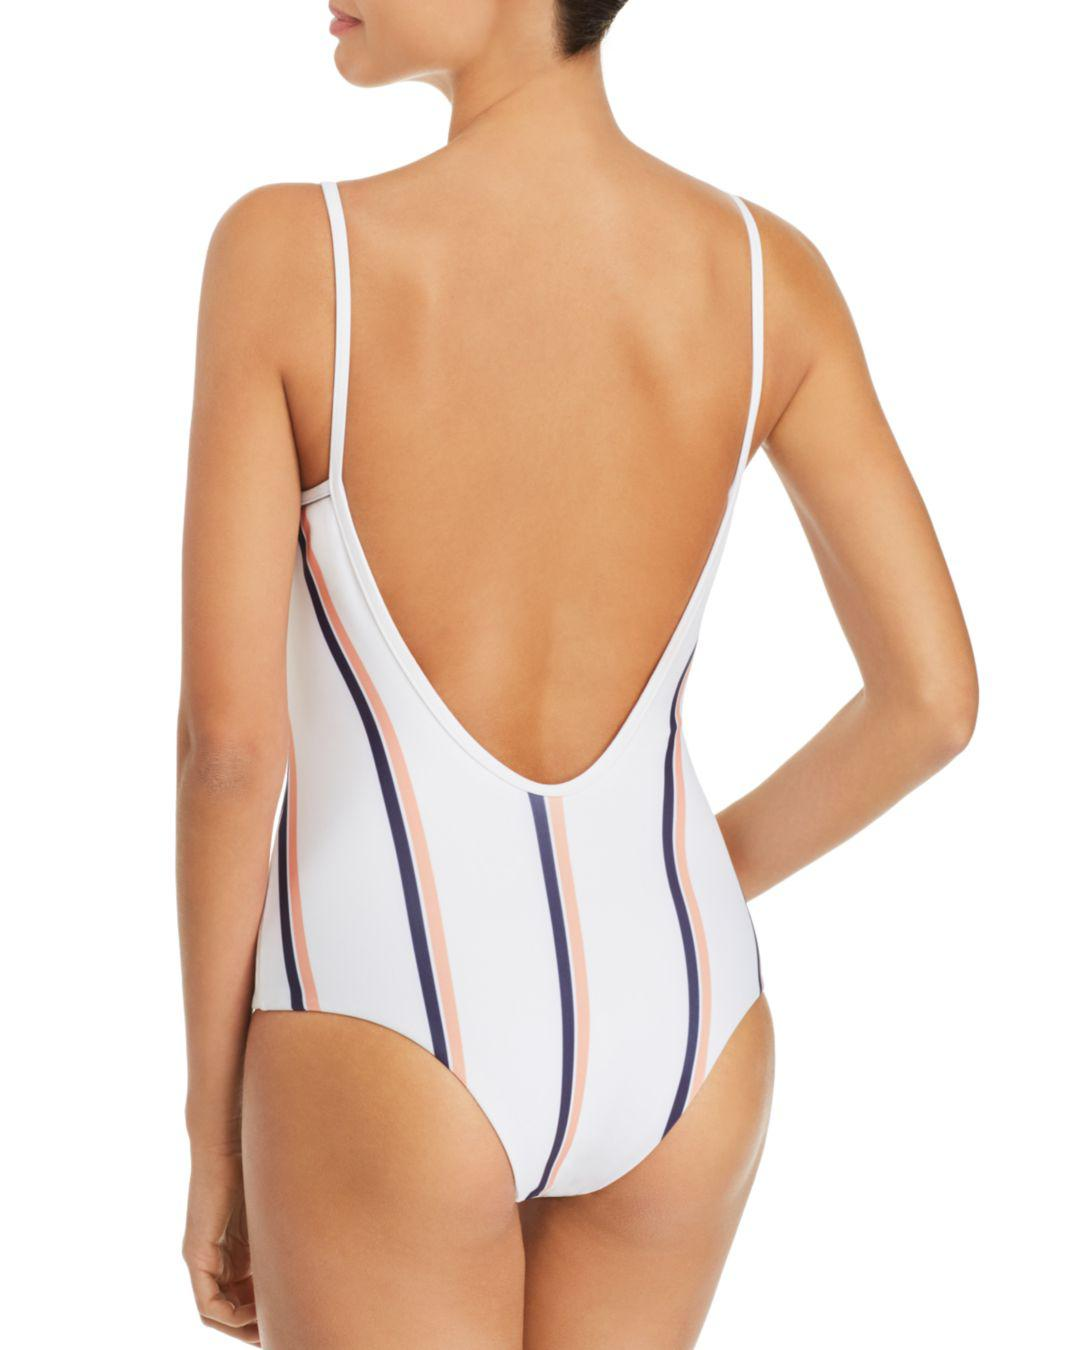 19caf2537a3da Lyst - Tavik Lila One Piece Swimsuit in White